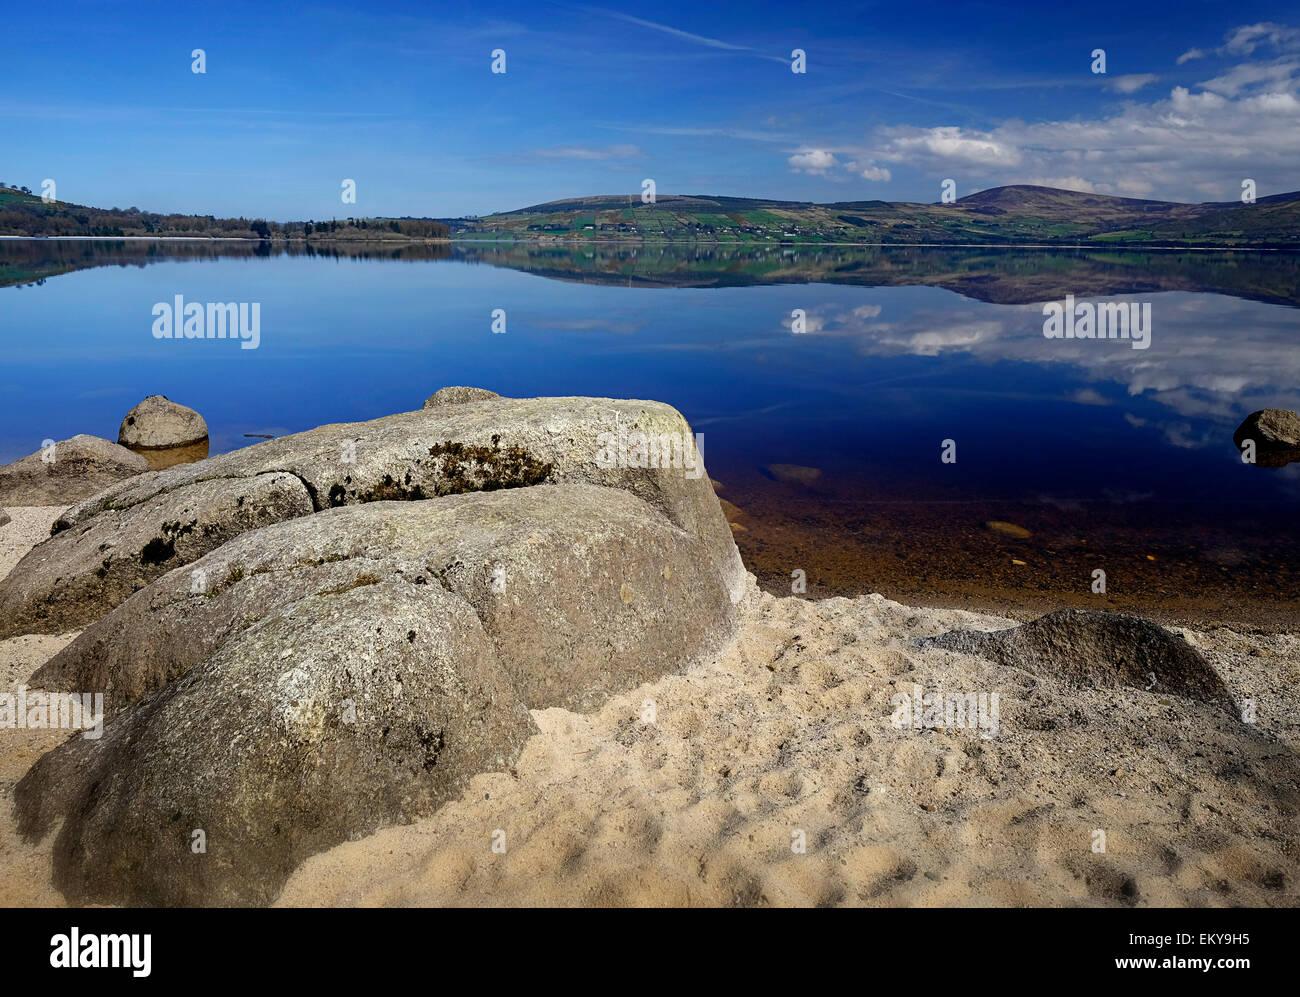 Blessington Lake Boat Hire (Ballyknockan - TripAdvisor